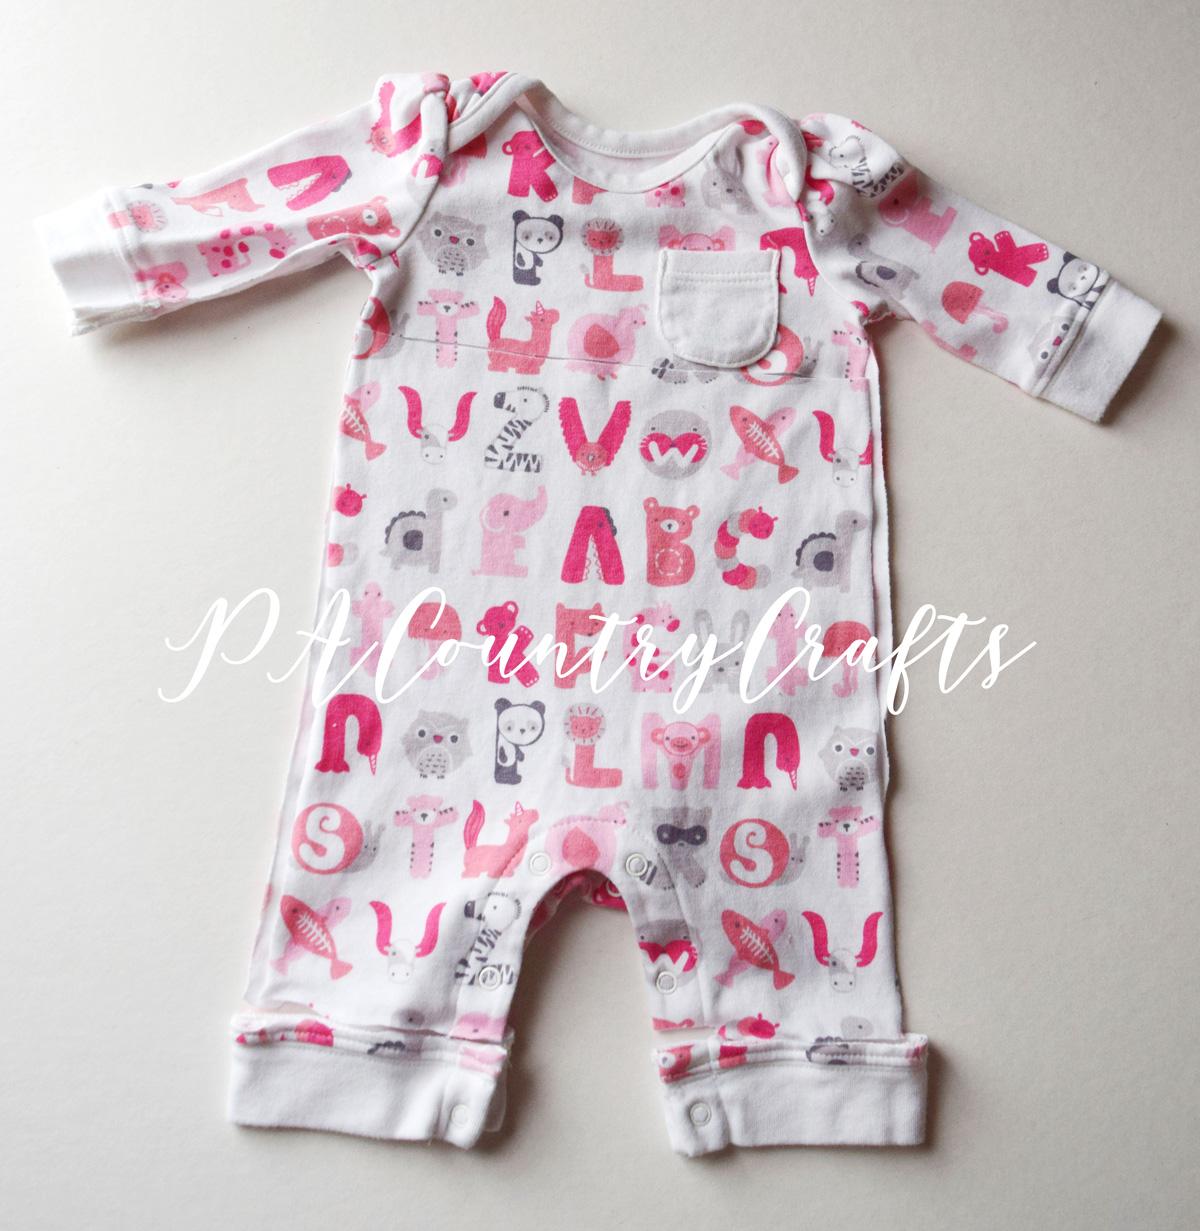 Use outgrown baby clothes to make a memory bear